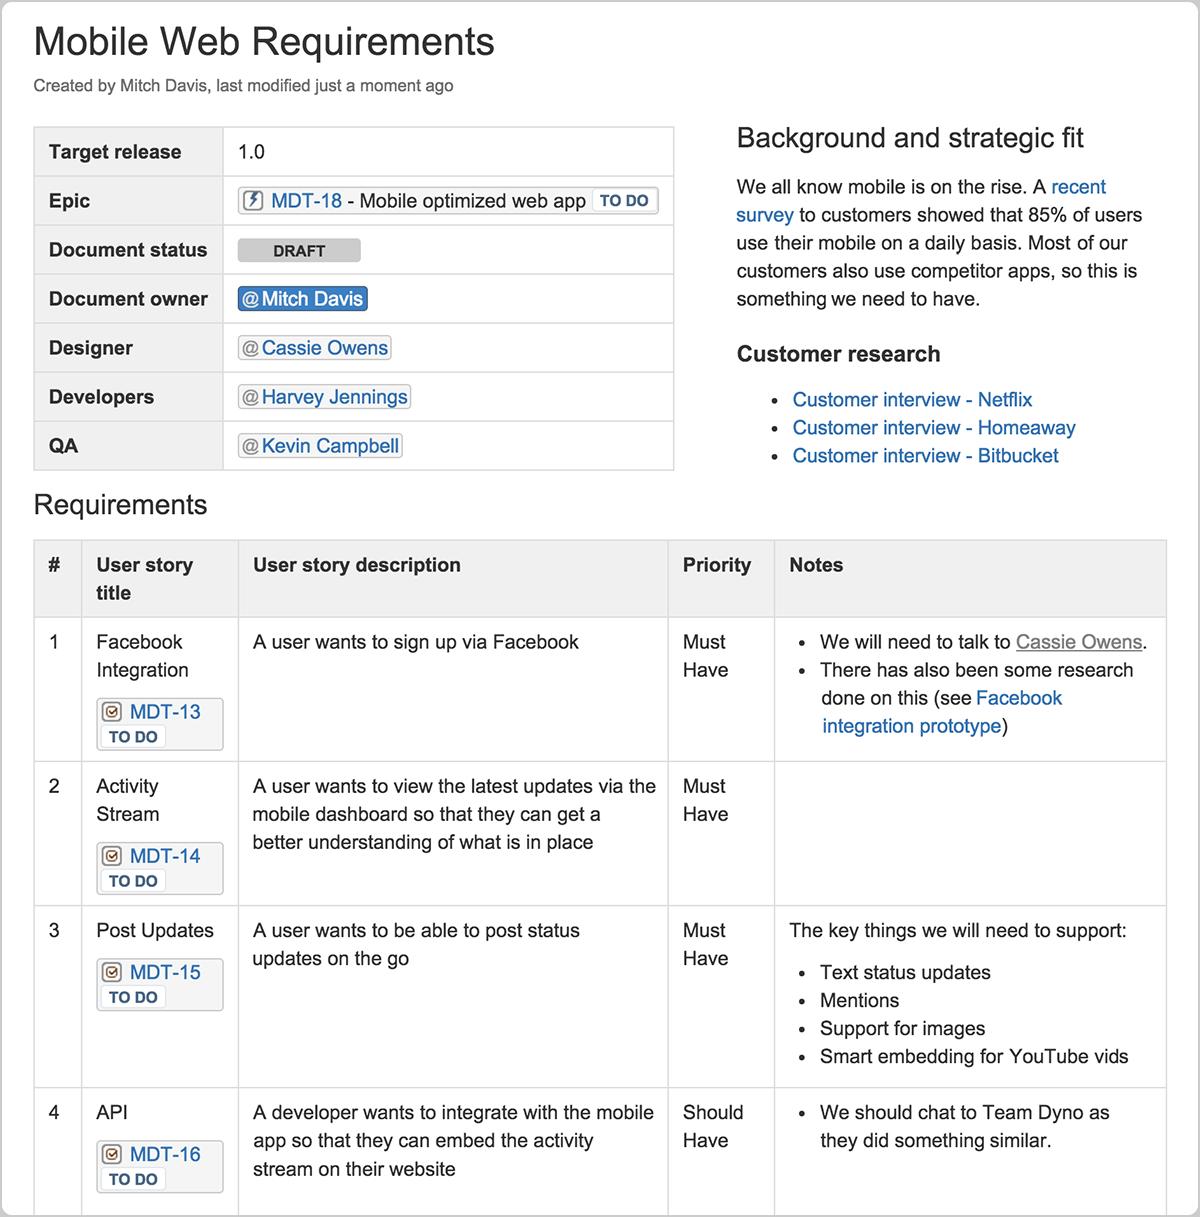 Beispiel eines agilen Produktanforderungsdokuments | Atlassian Agile Coach